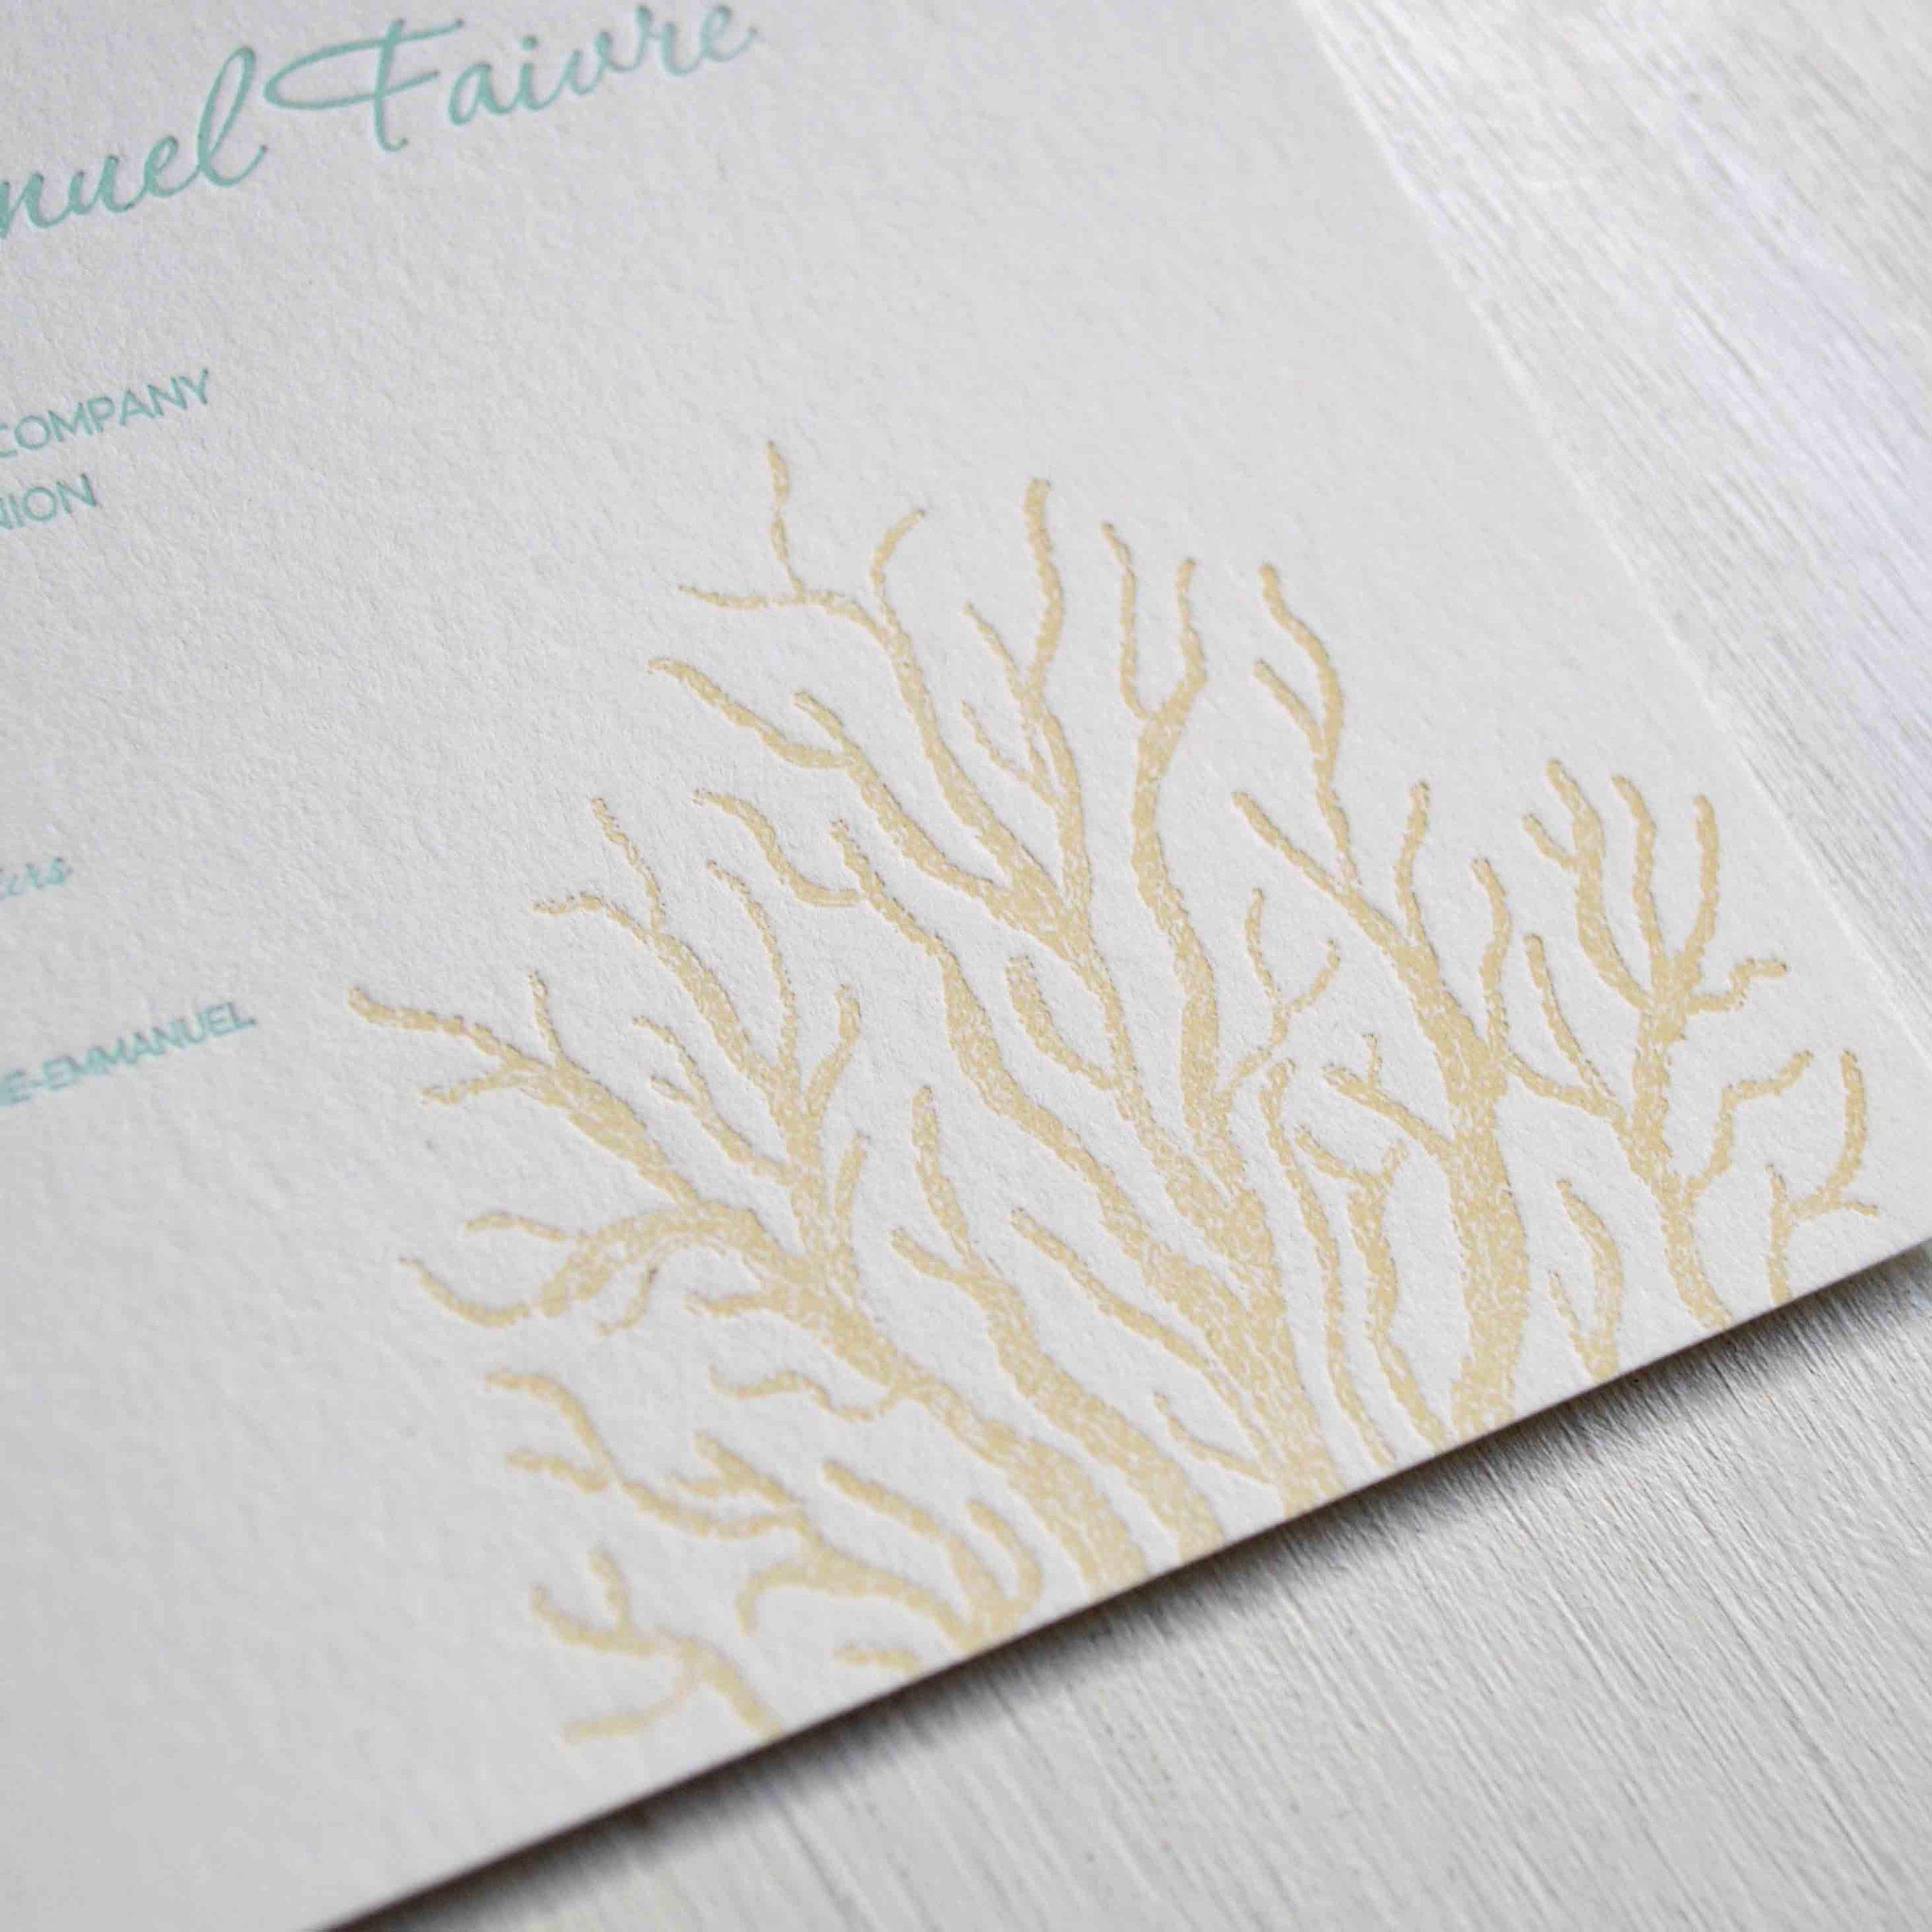 Y&P letterpress wedding invitation 3.jpg